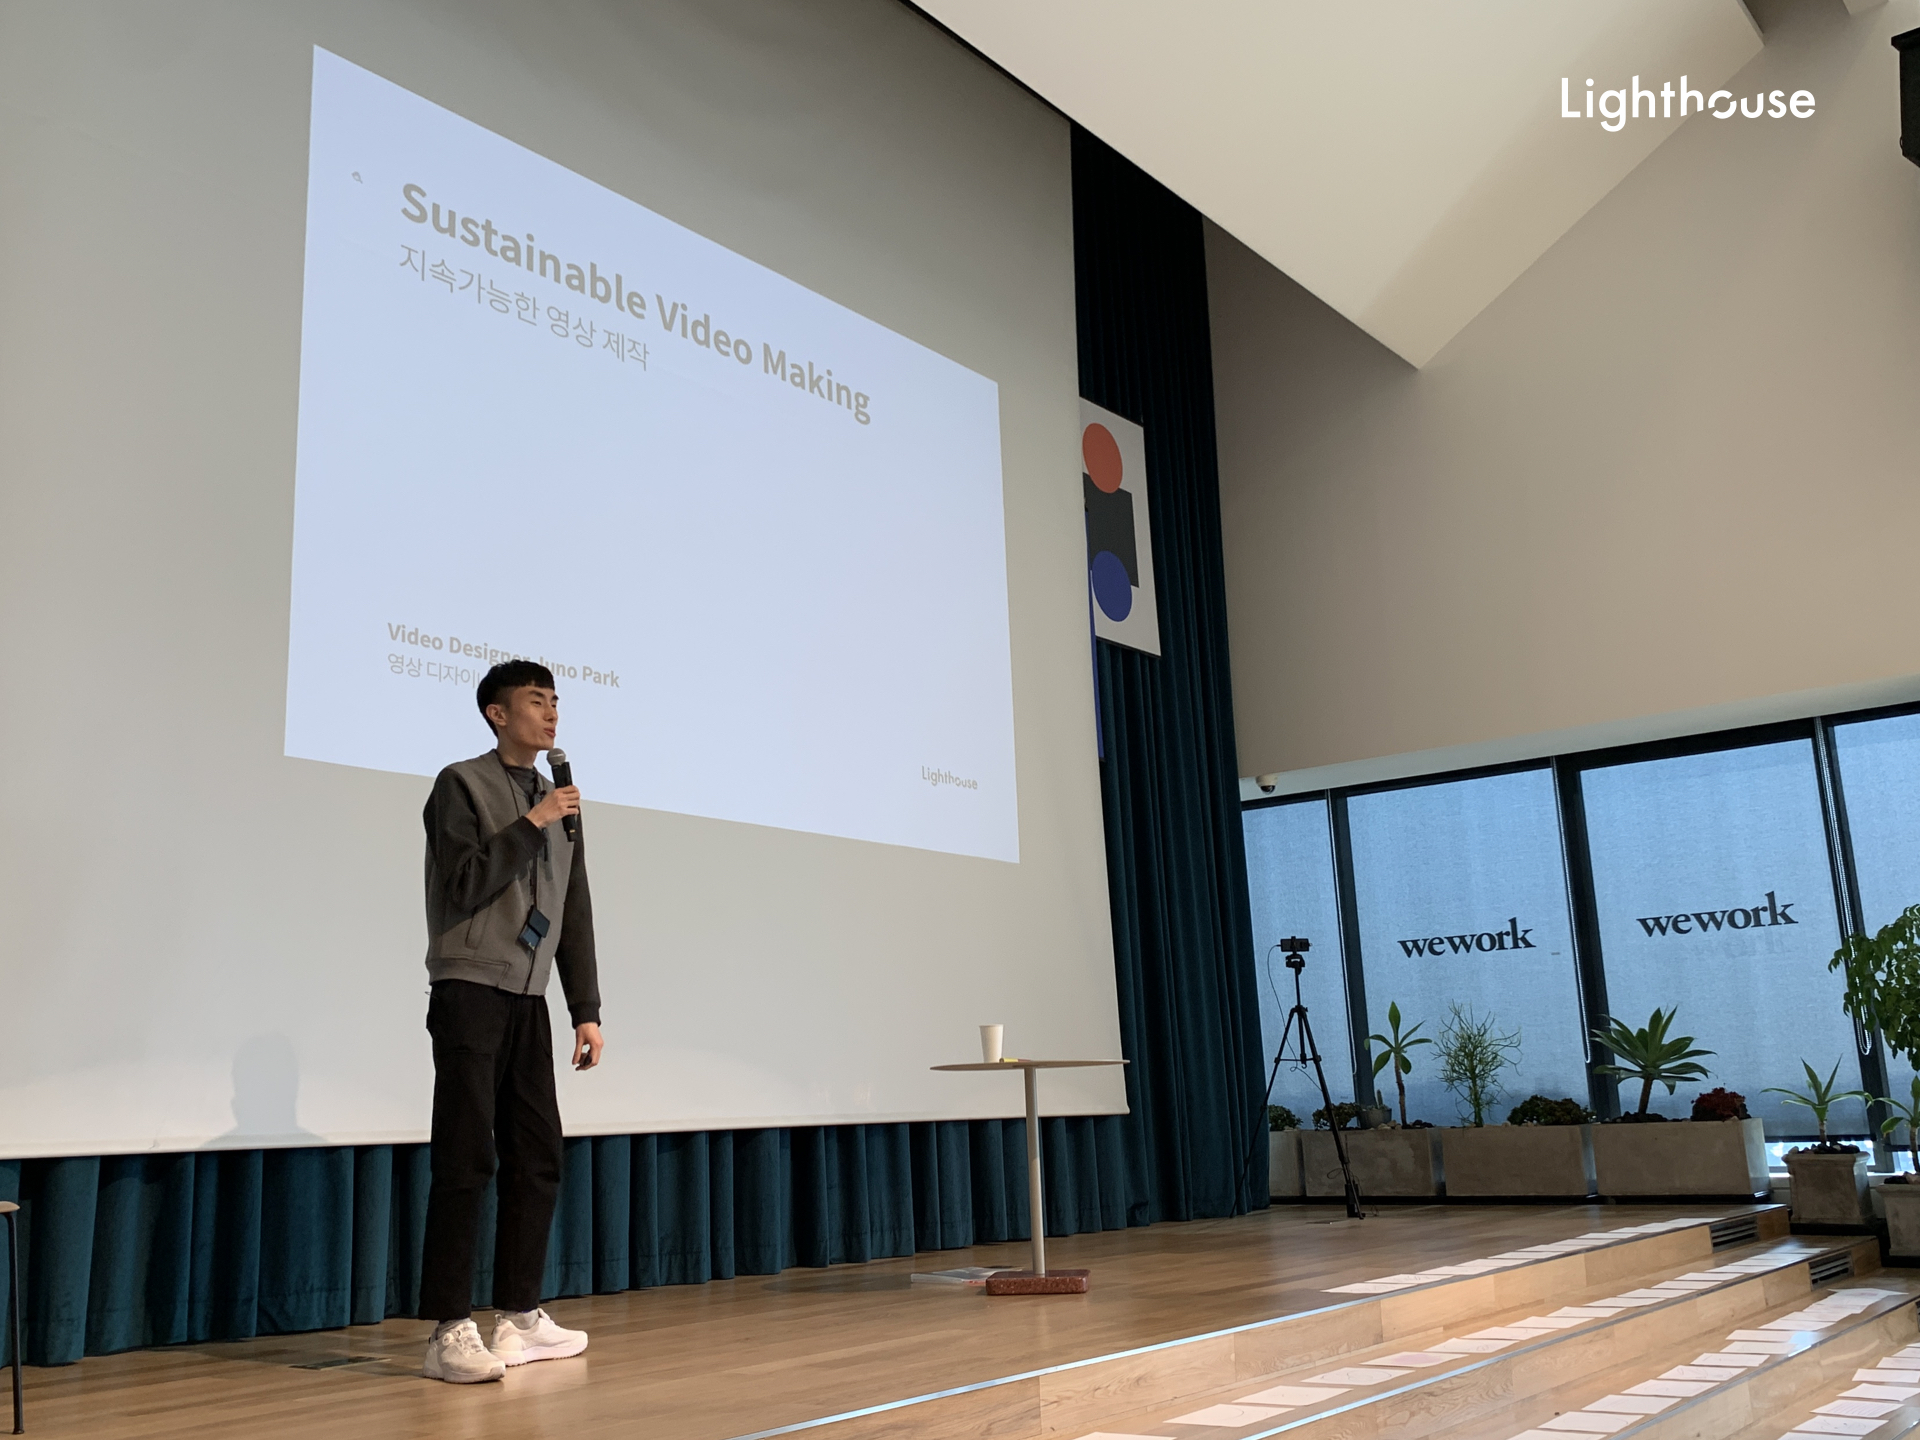 Lighthouse Workshops Photos_Lighting Up Ventures Inc.002.jpeg